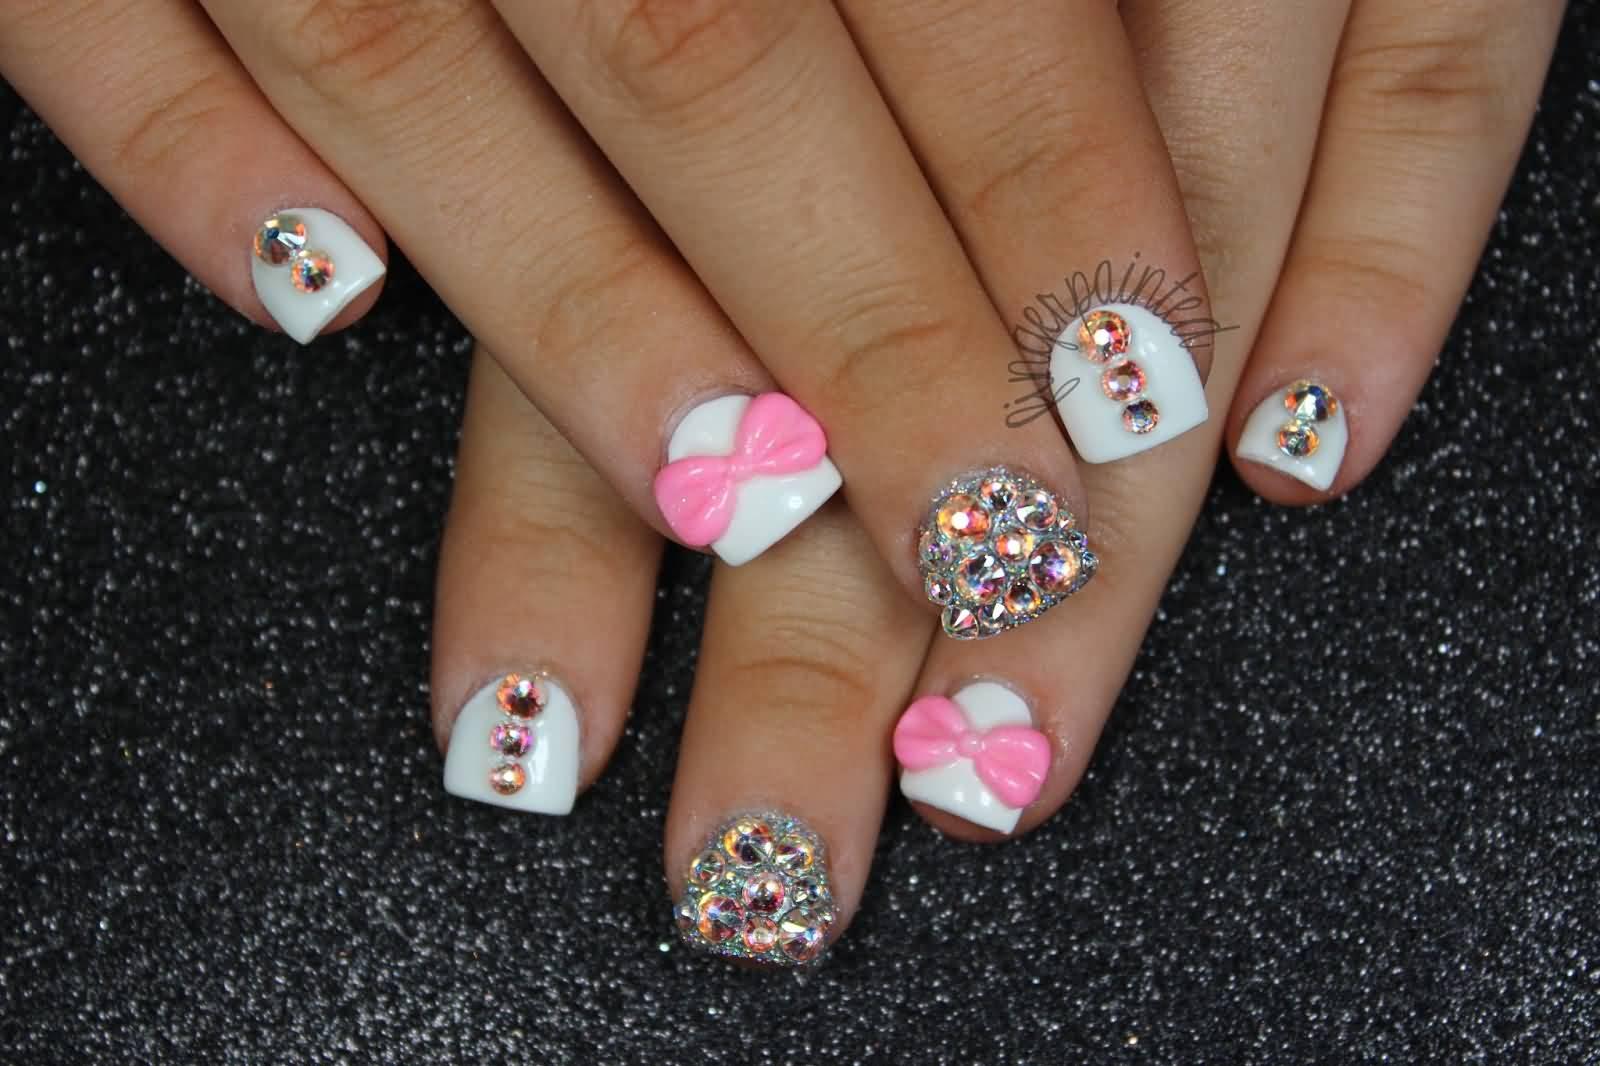 Colorful Acrylic Hump Nails Inspiration - Nail Art Design Ideas ...